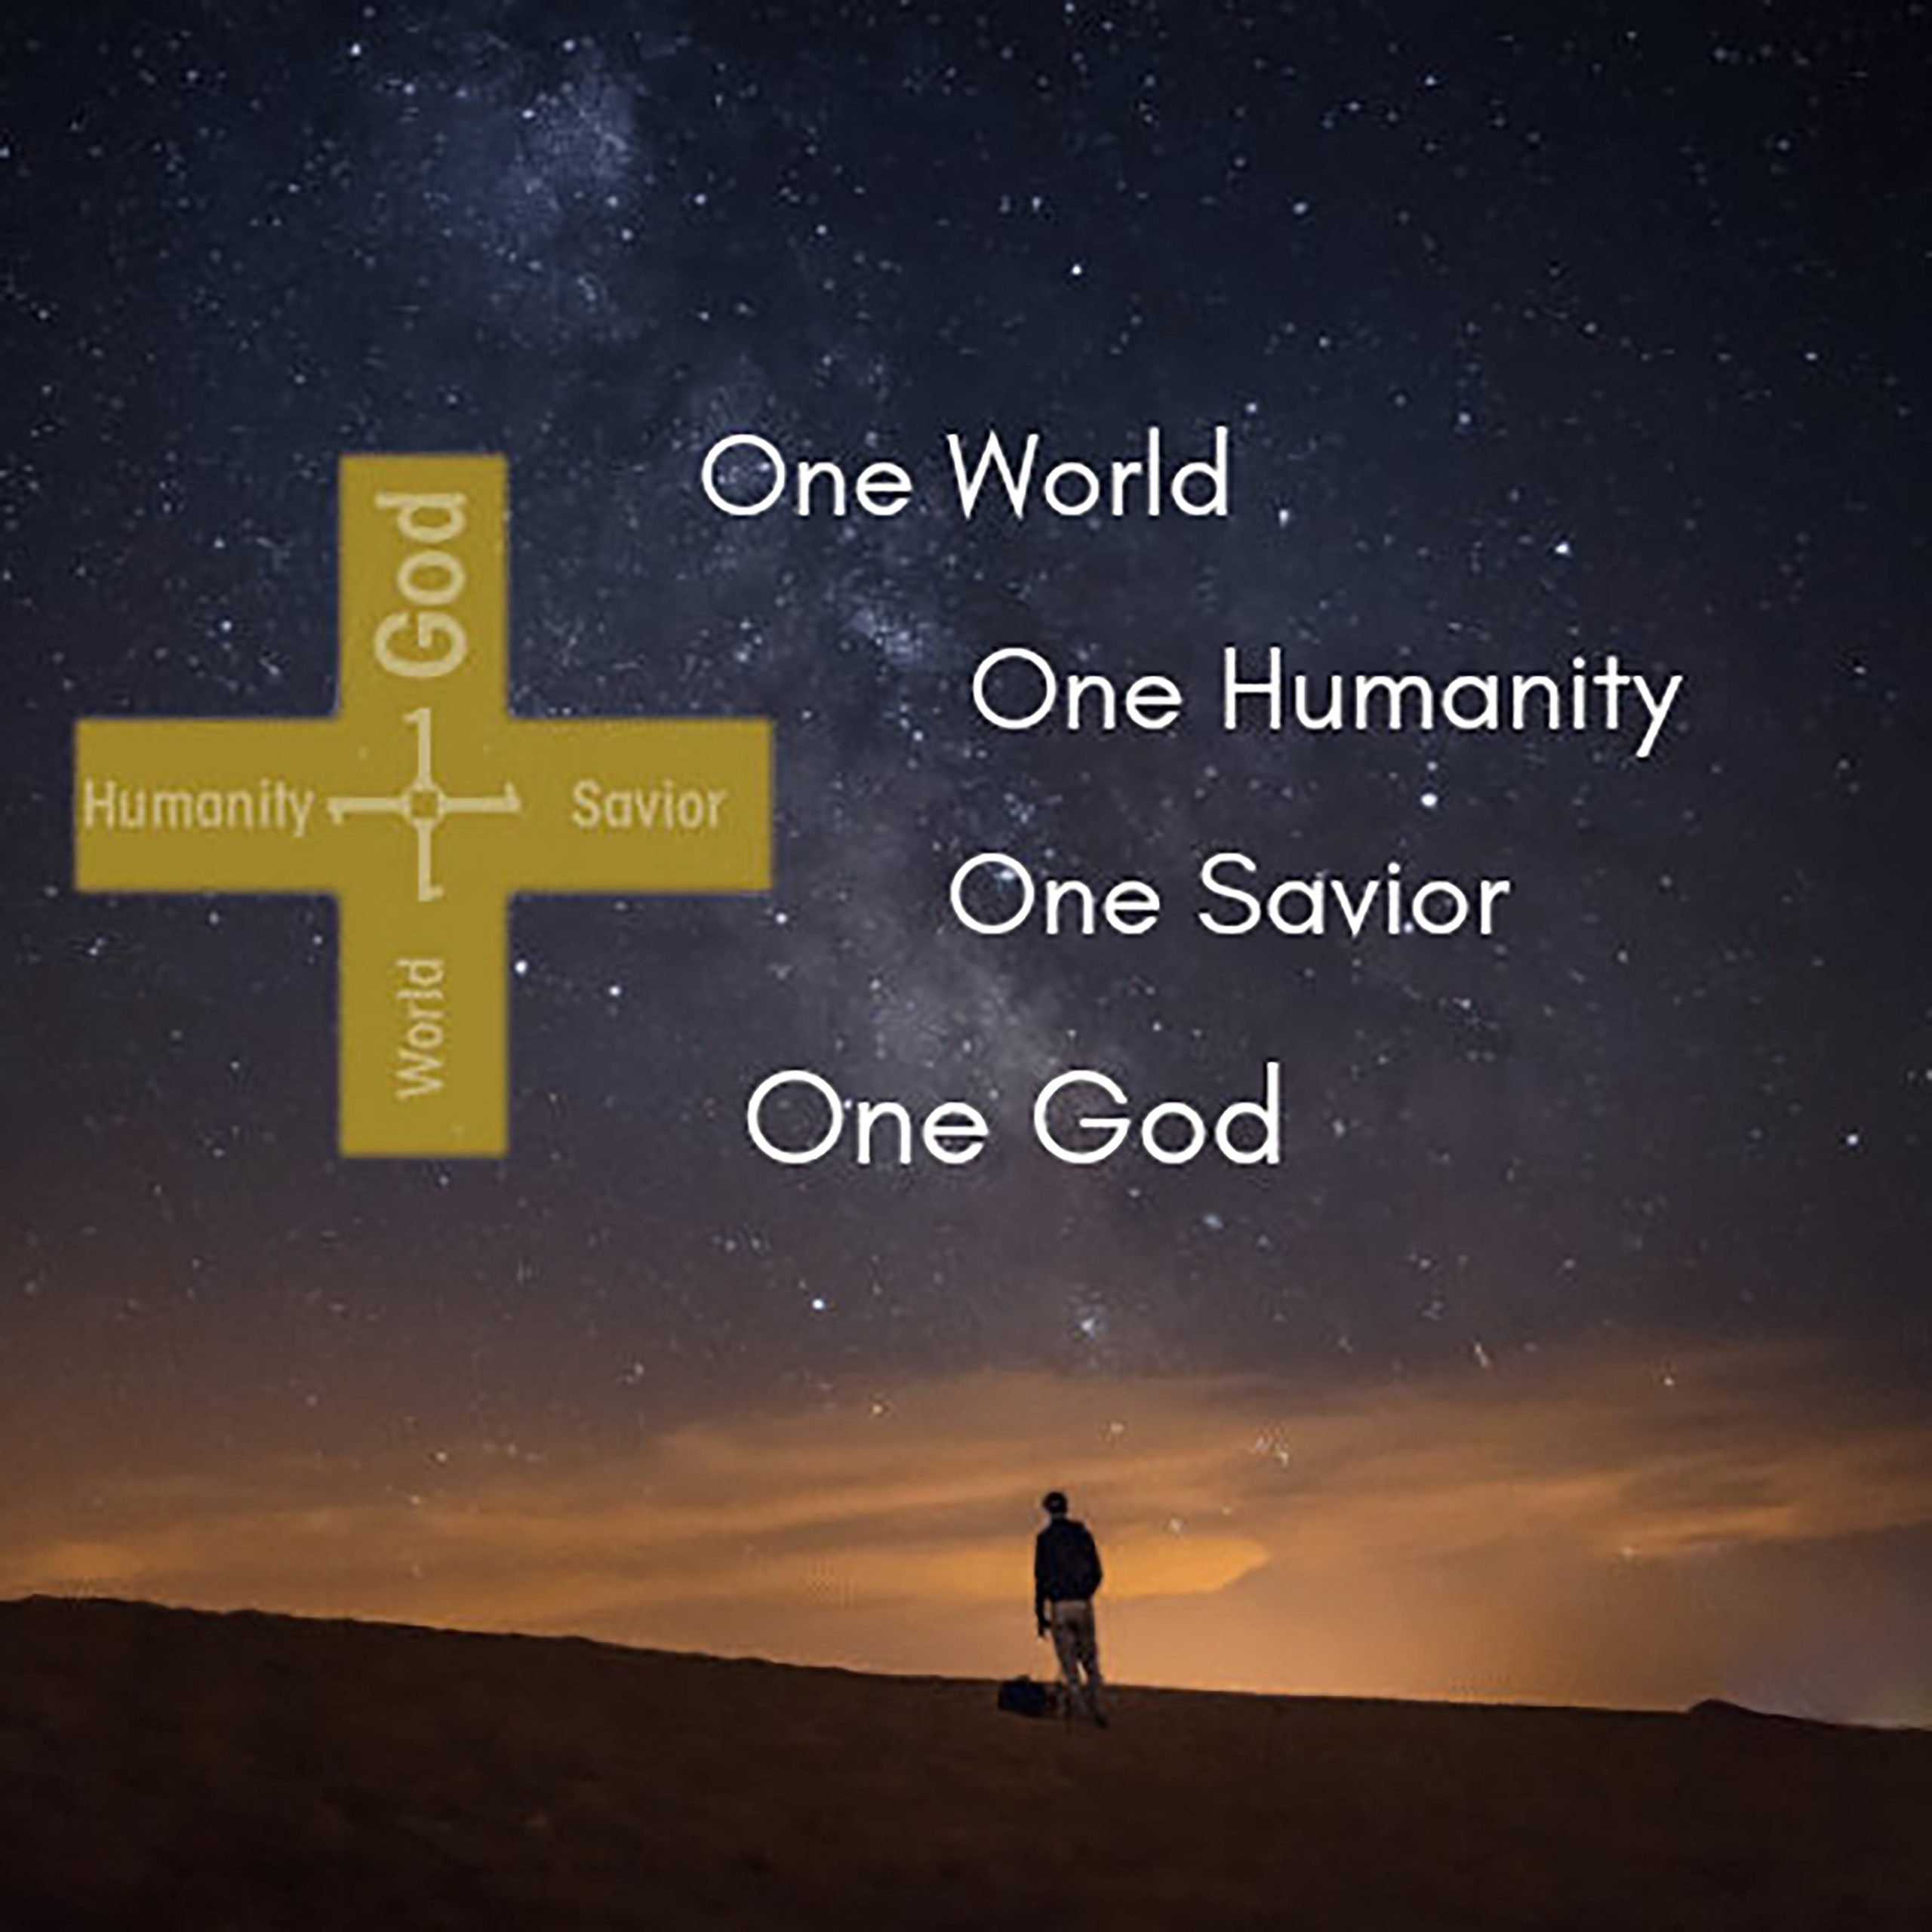 1 World, 1 Humanity, 1 Savior, 1 God